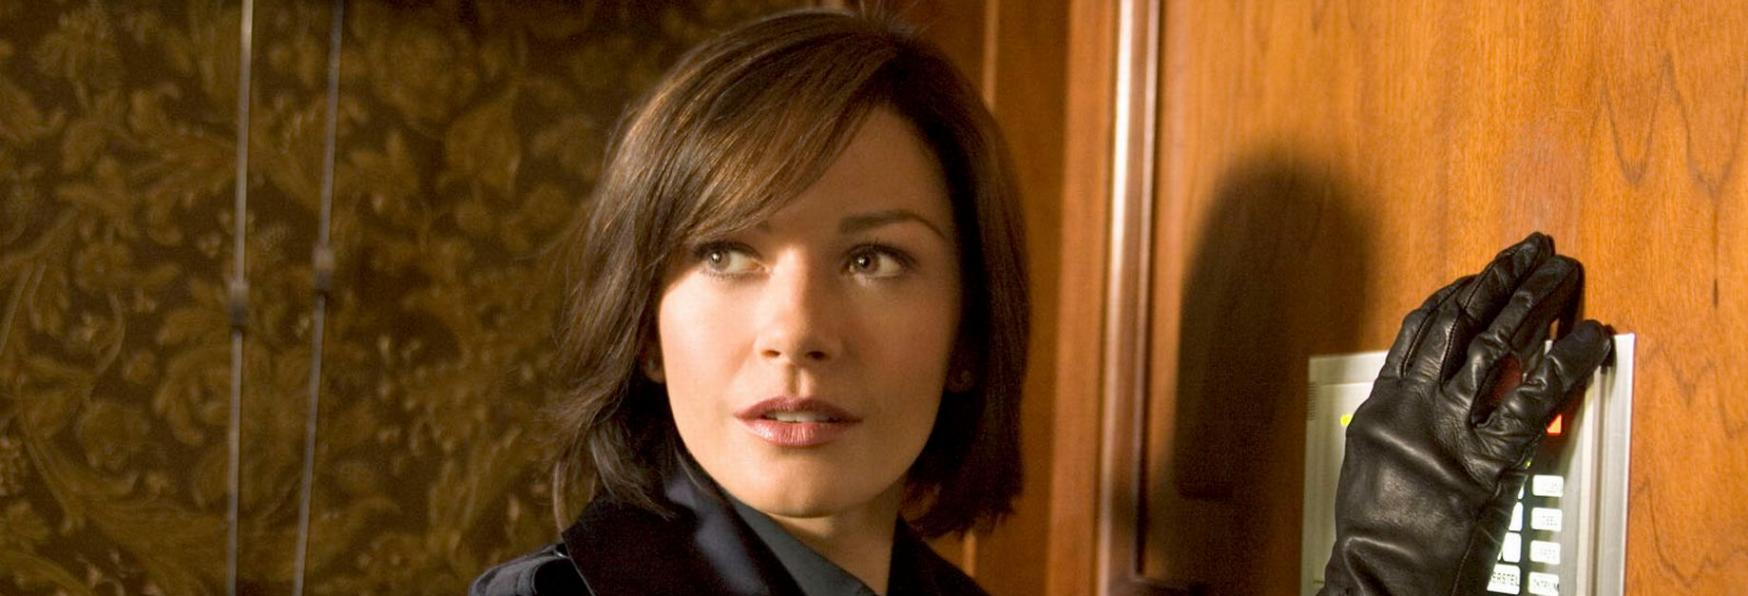 Prodigal Son 2: Catherine Zeta-Jones tra i Protagonisti della nuova Stagione